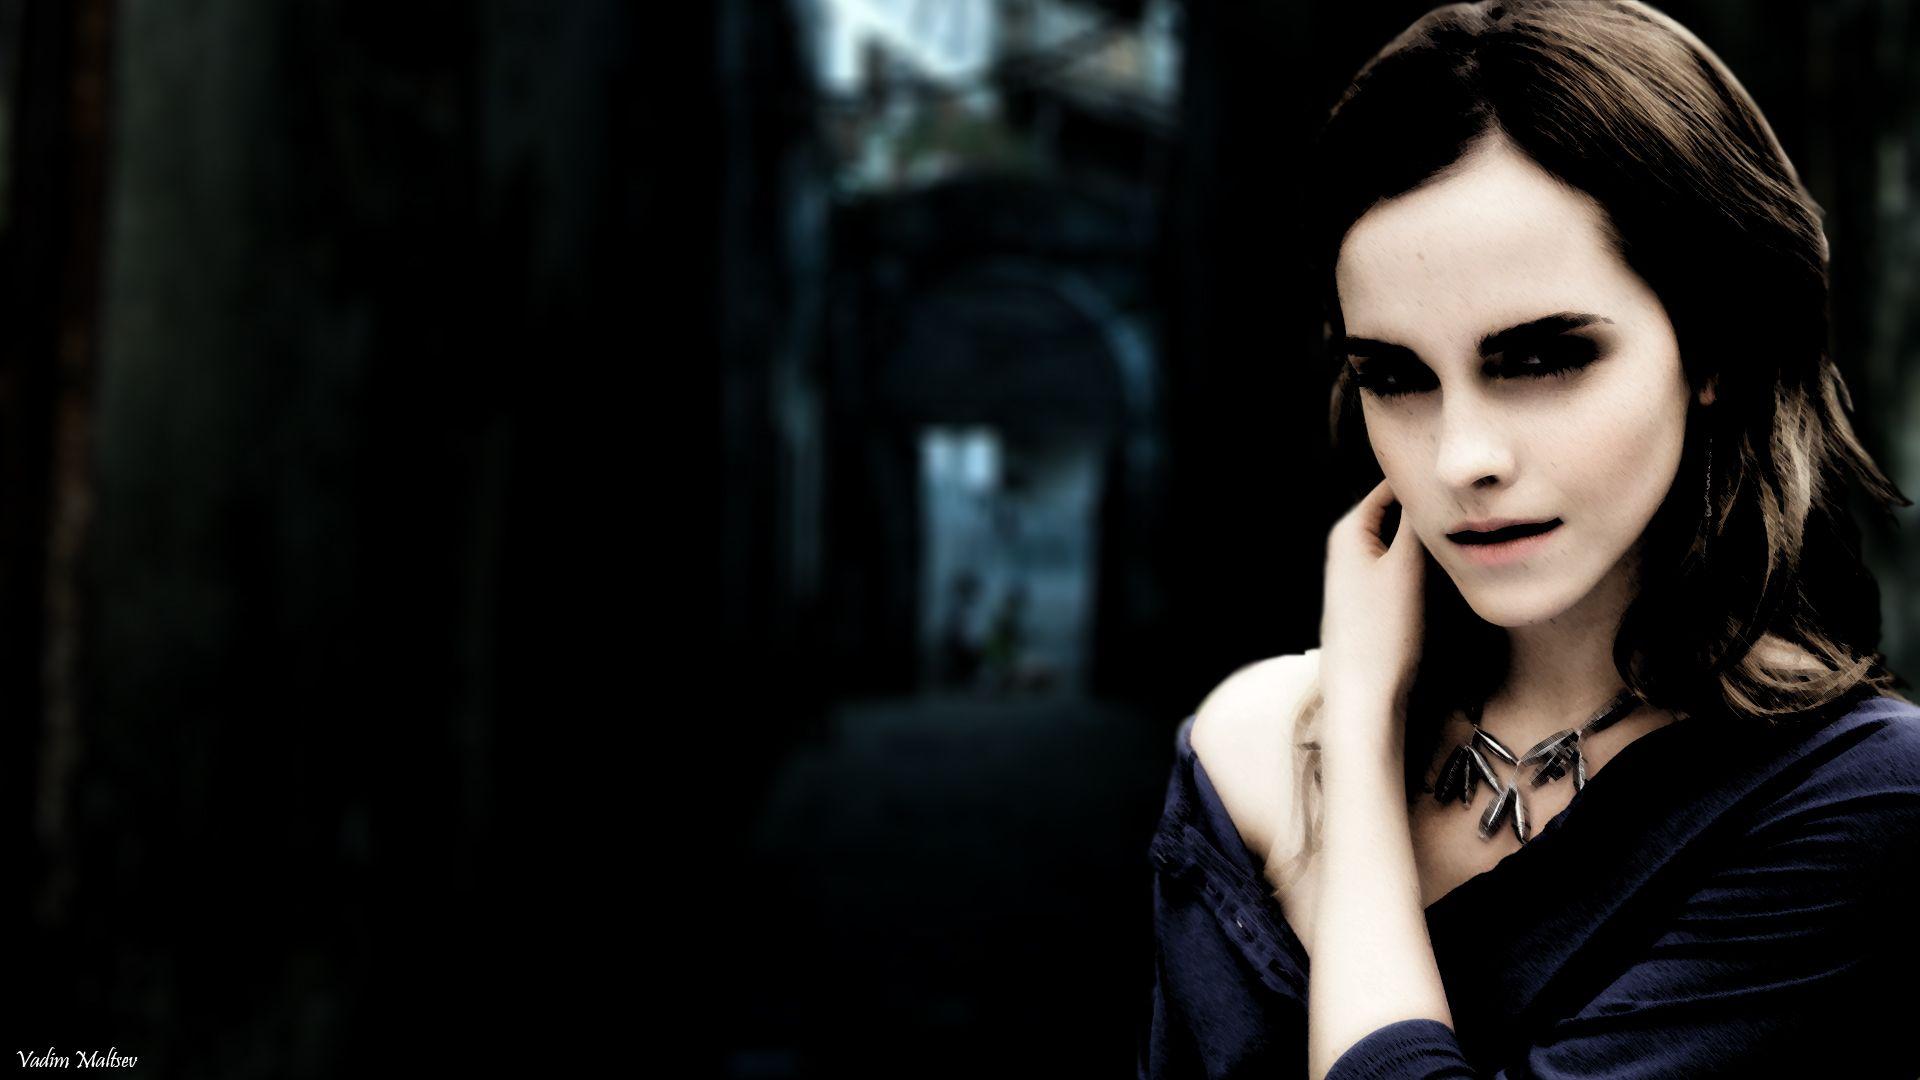 Hd wallpaper emma watson - Emma Watson Hd Wallpapers Wallpaper 2560 1440 Emma Watson Pics Wallpapers 58 Wallpapers